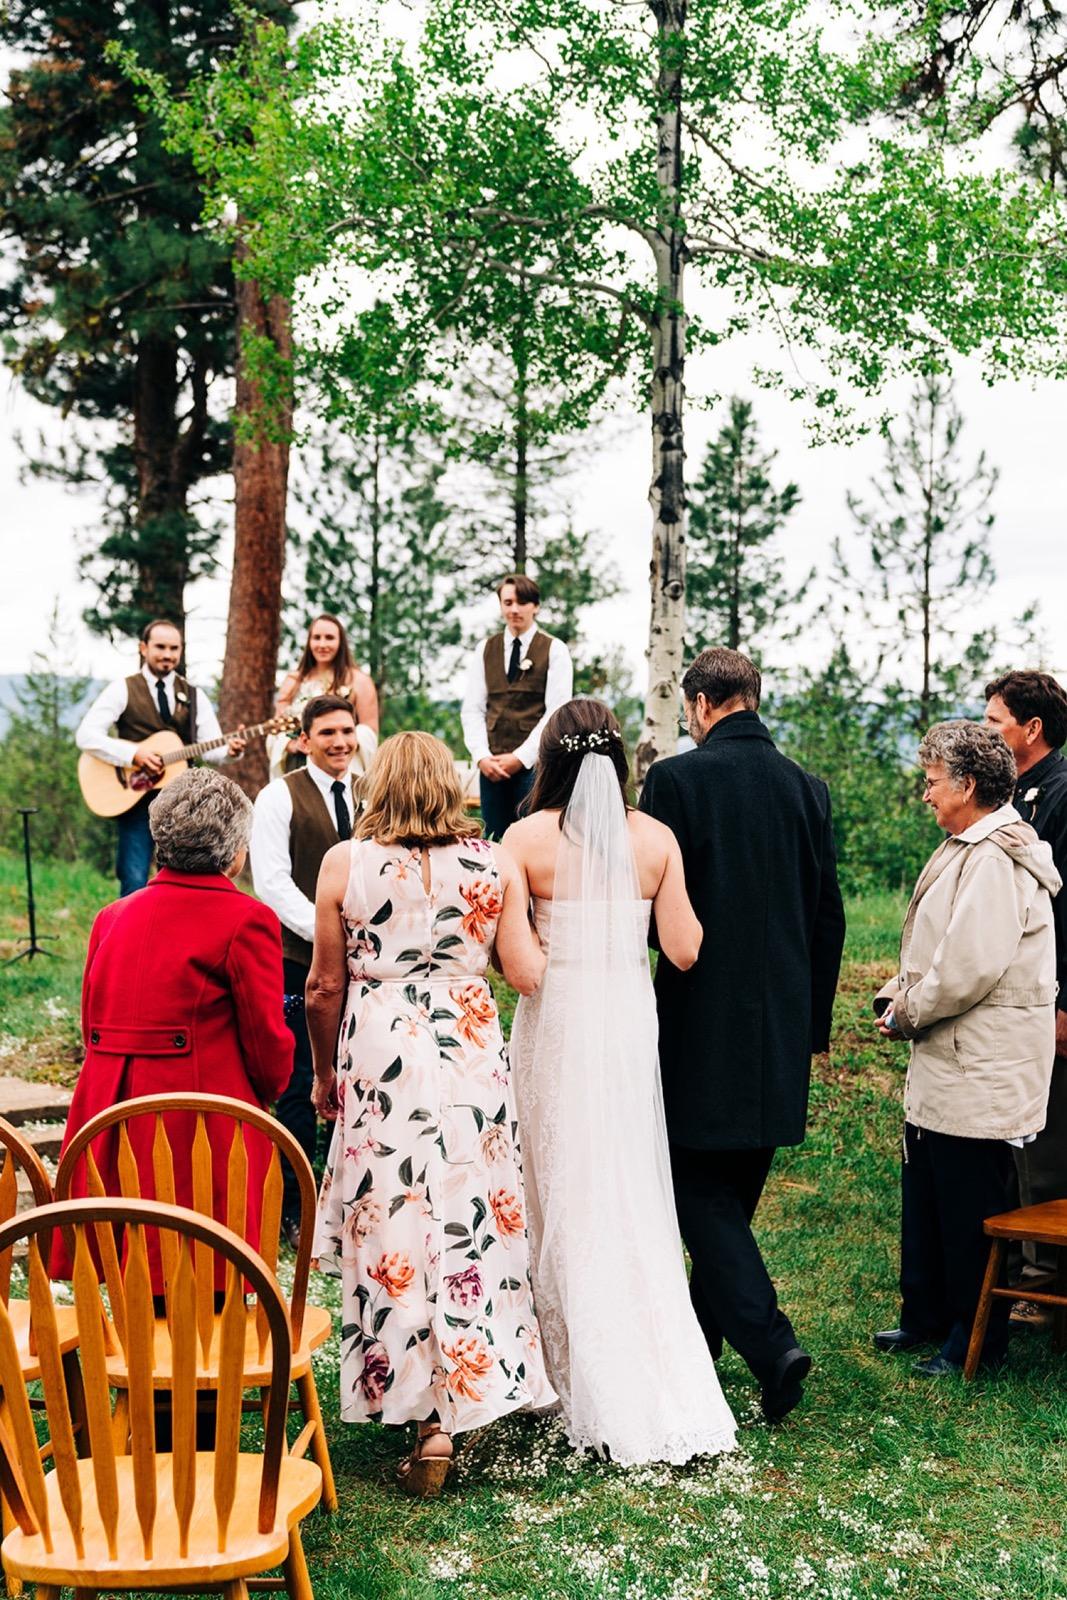 036_katie_chris_wedding-79.jpg